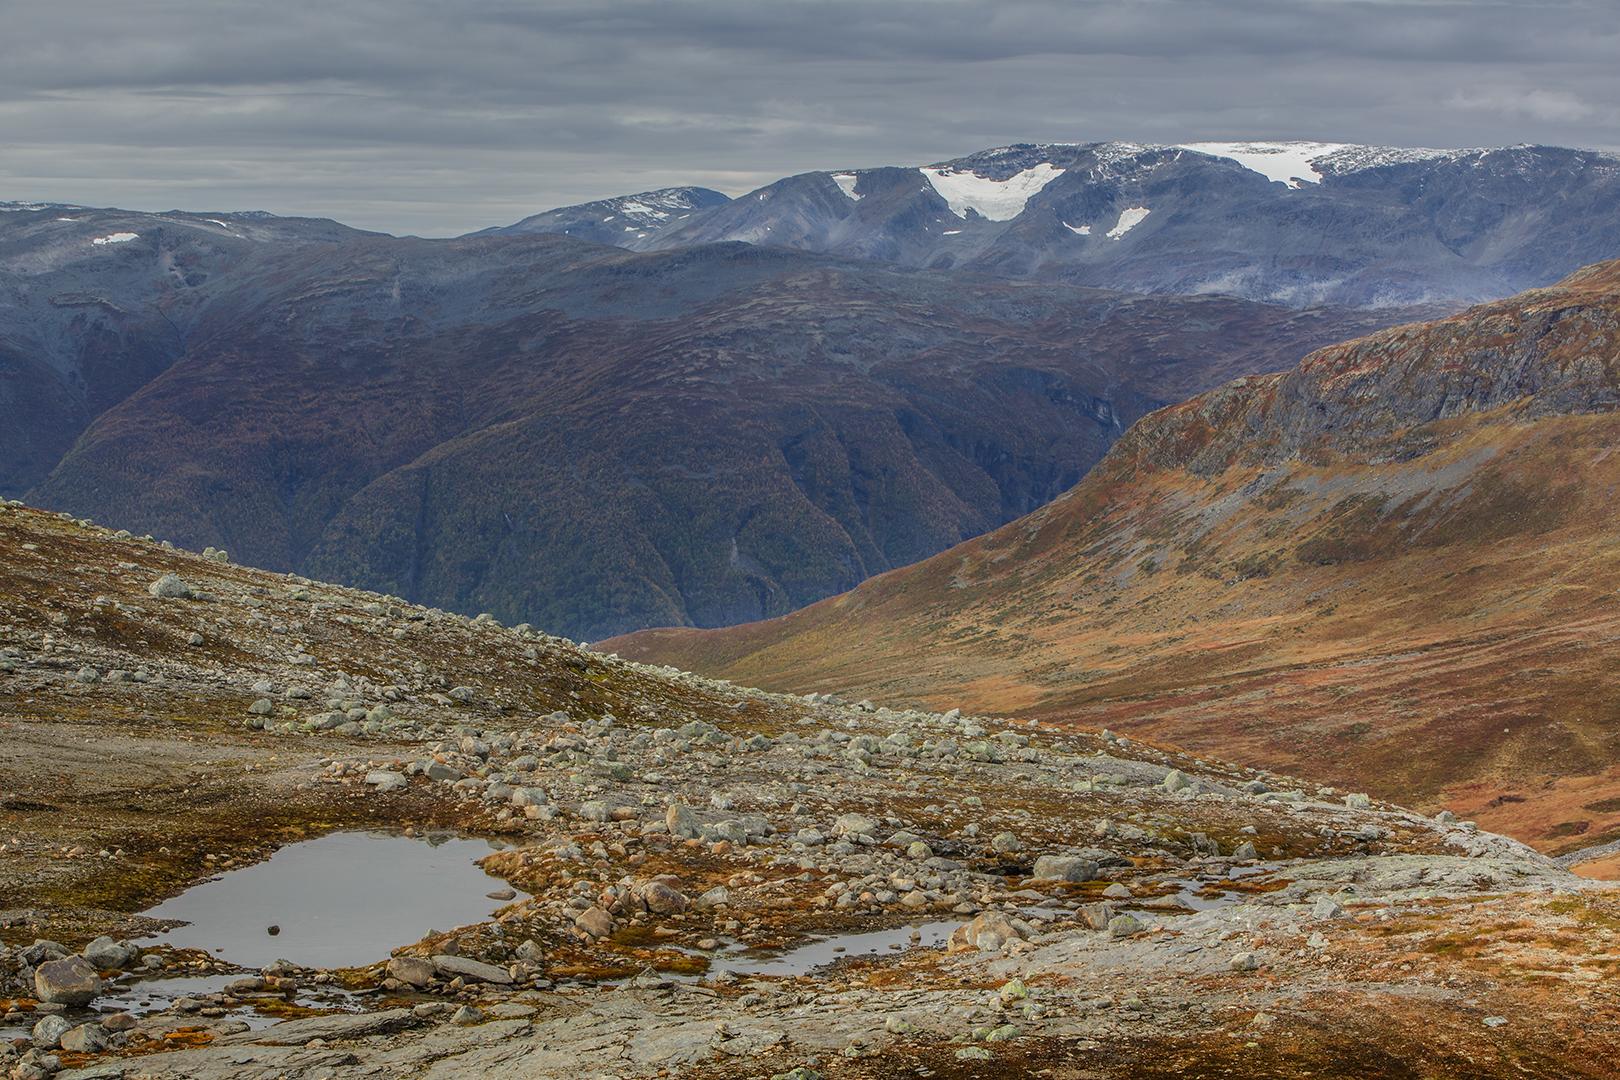 0336 Aurlandsfjellet 29-09-2013 B_V_1620